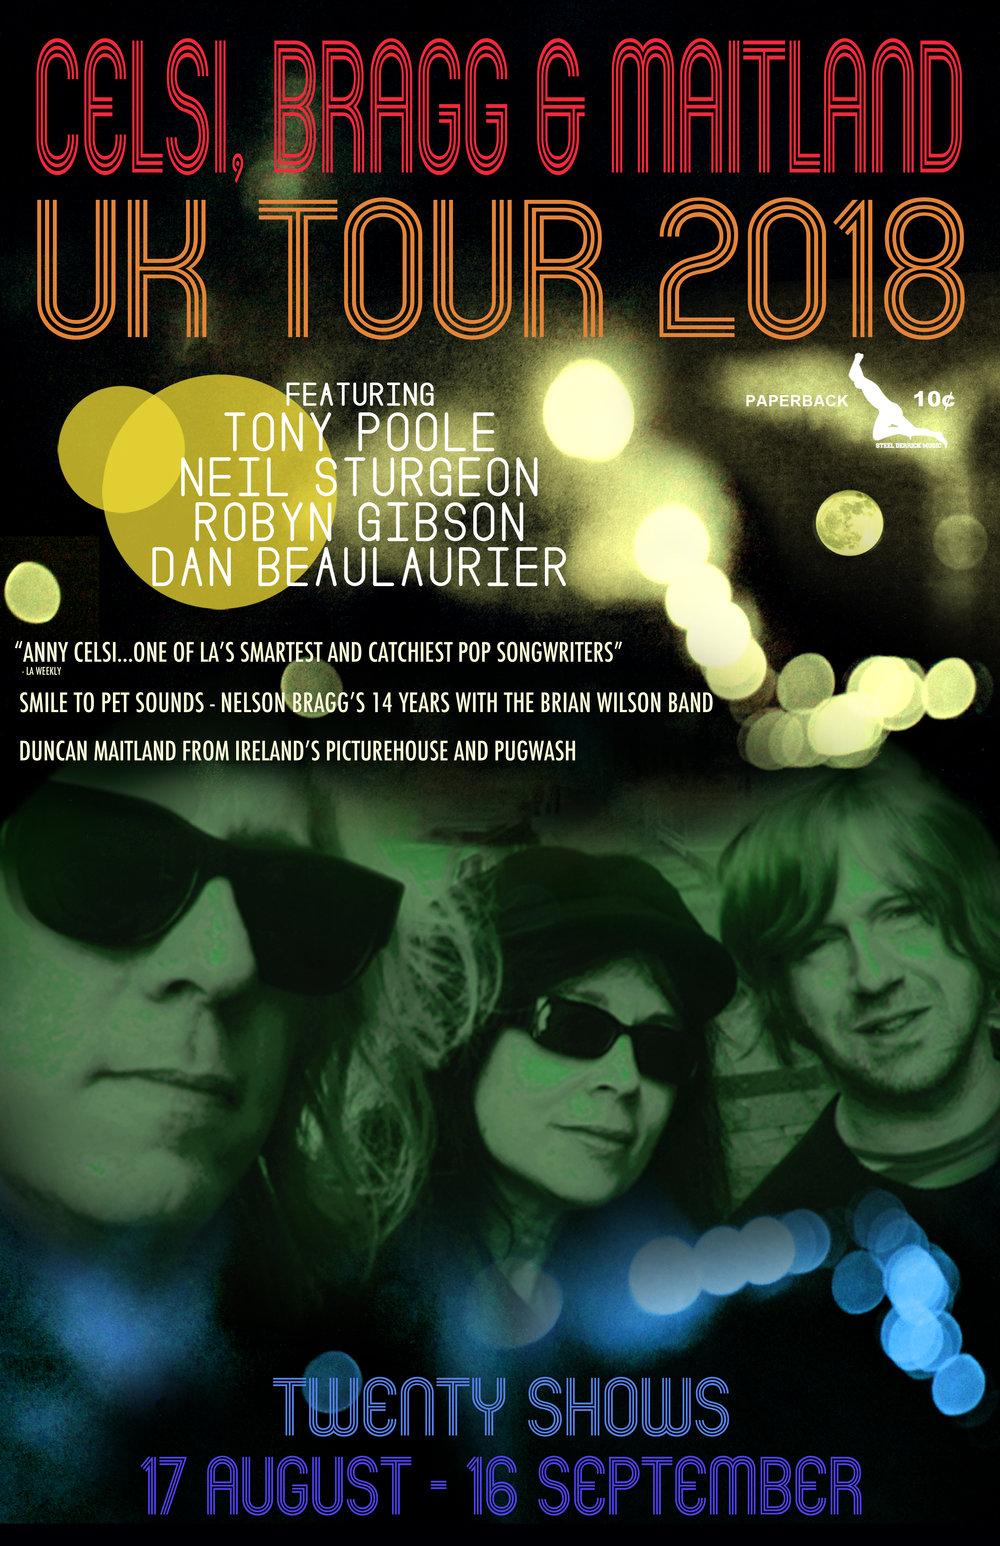 Celsi, Bragg & Maitland UK TOUR 2018 | POSTER 11x17 MAIN NEW THIS ONE.jpg